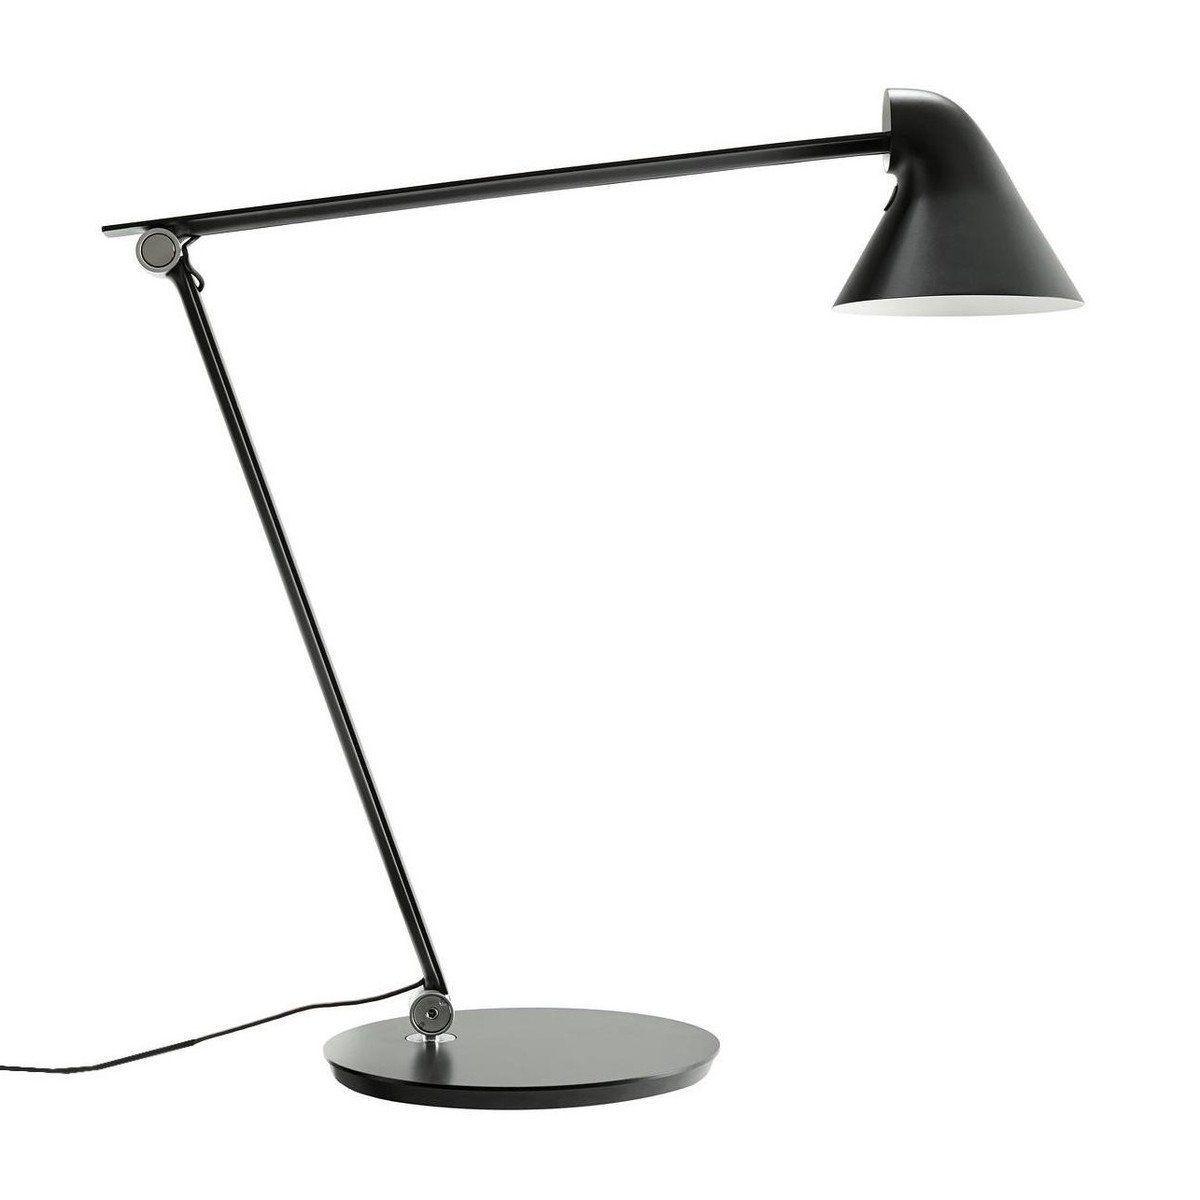 Njp led table lamp louis poulsen ambientedirect louis poulsen njp led table lamp mozeypictures Choice Image